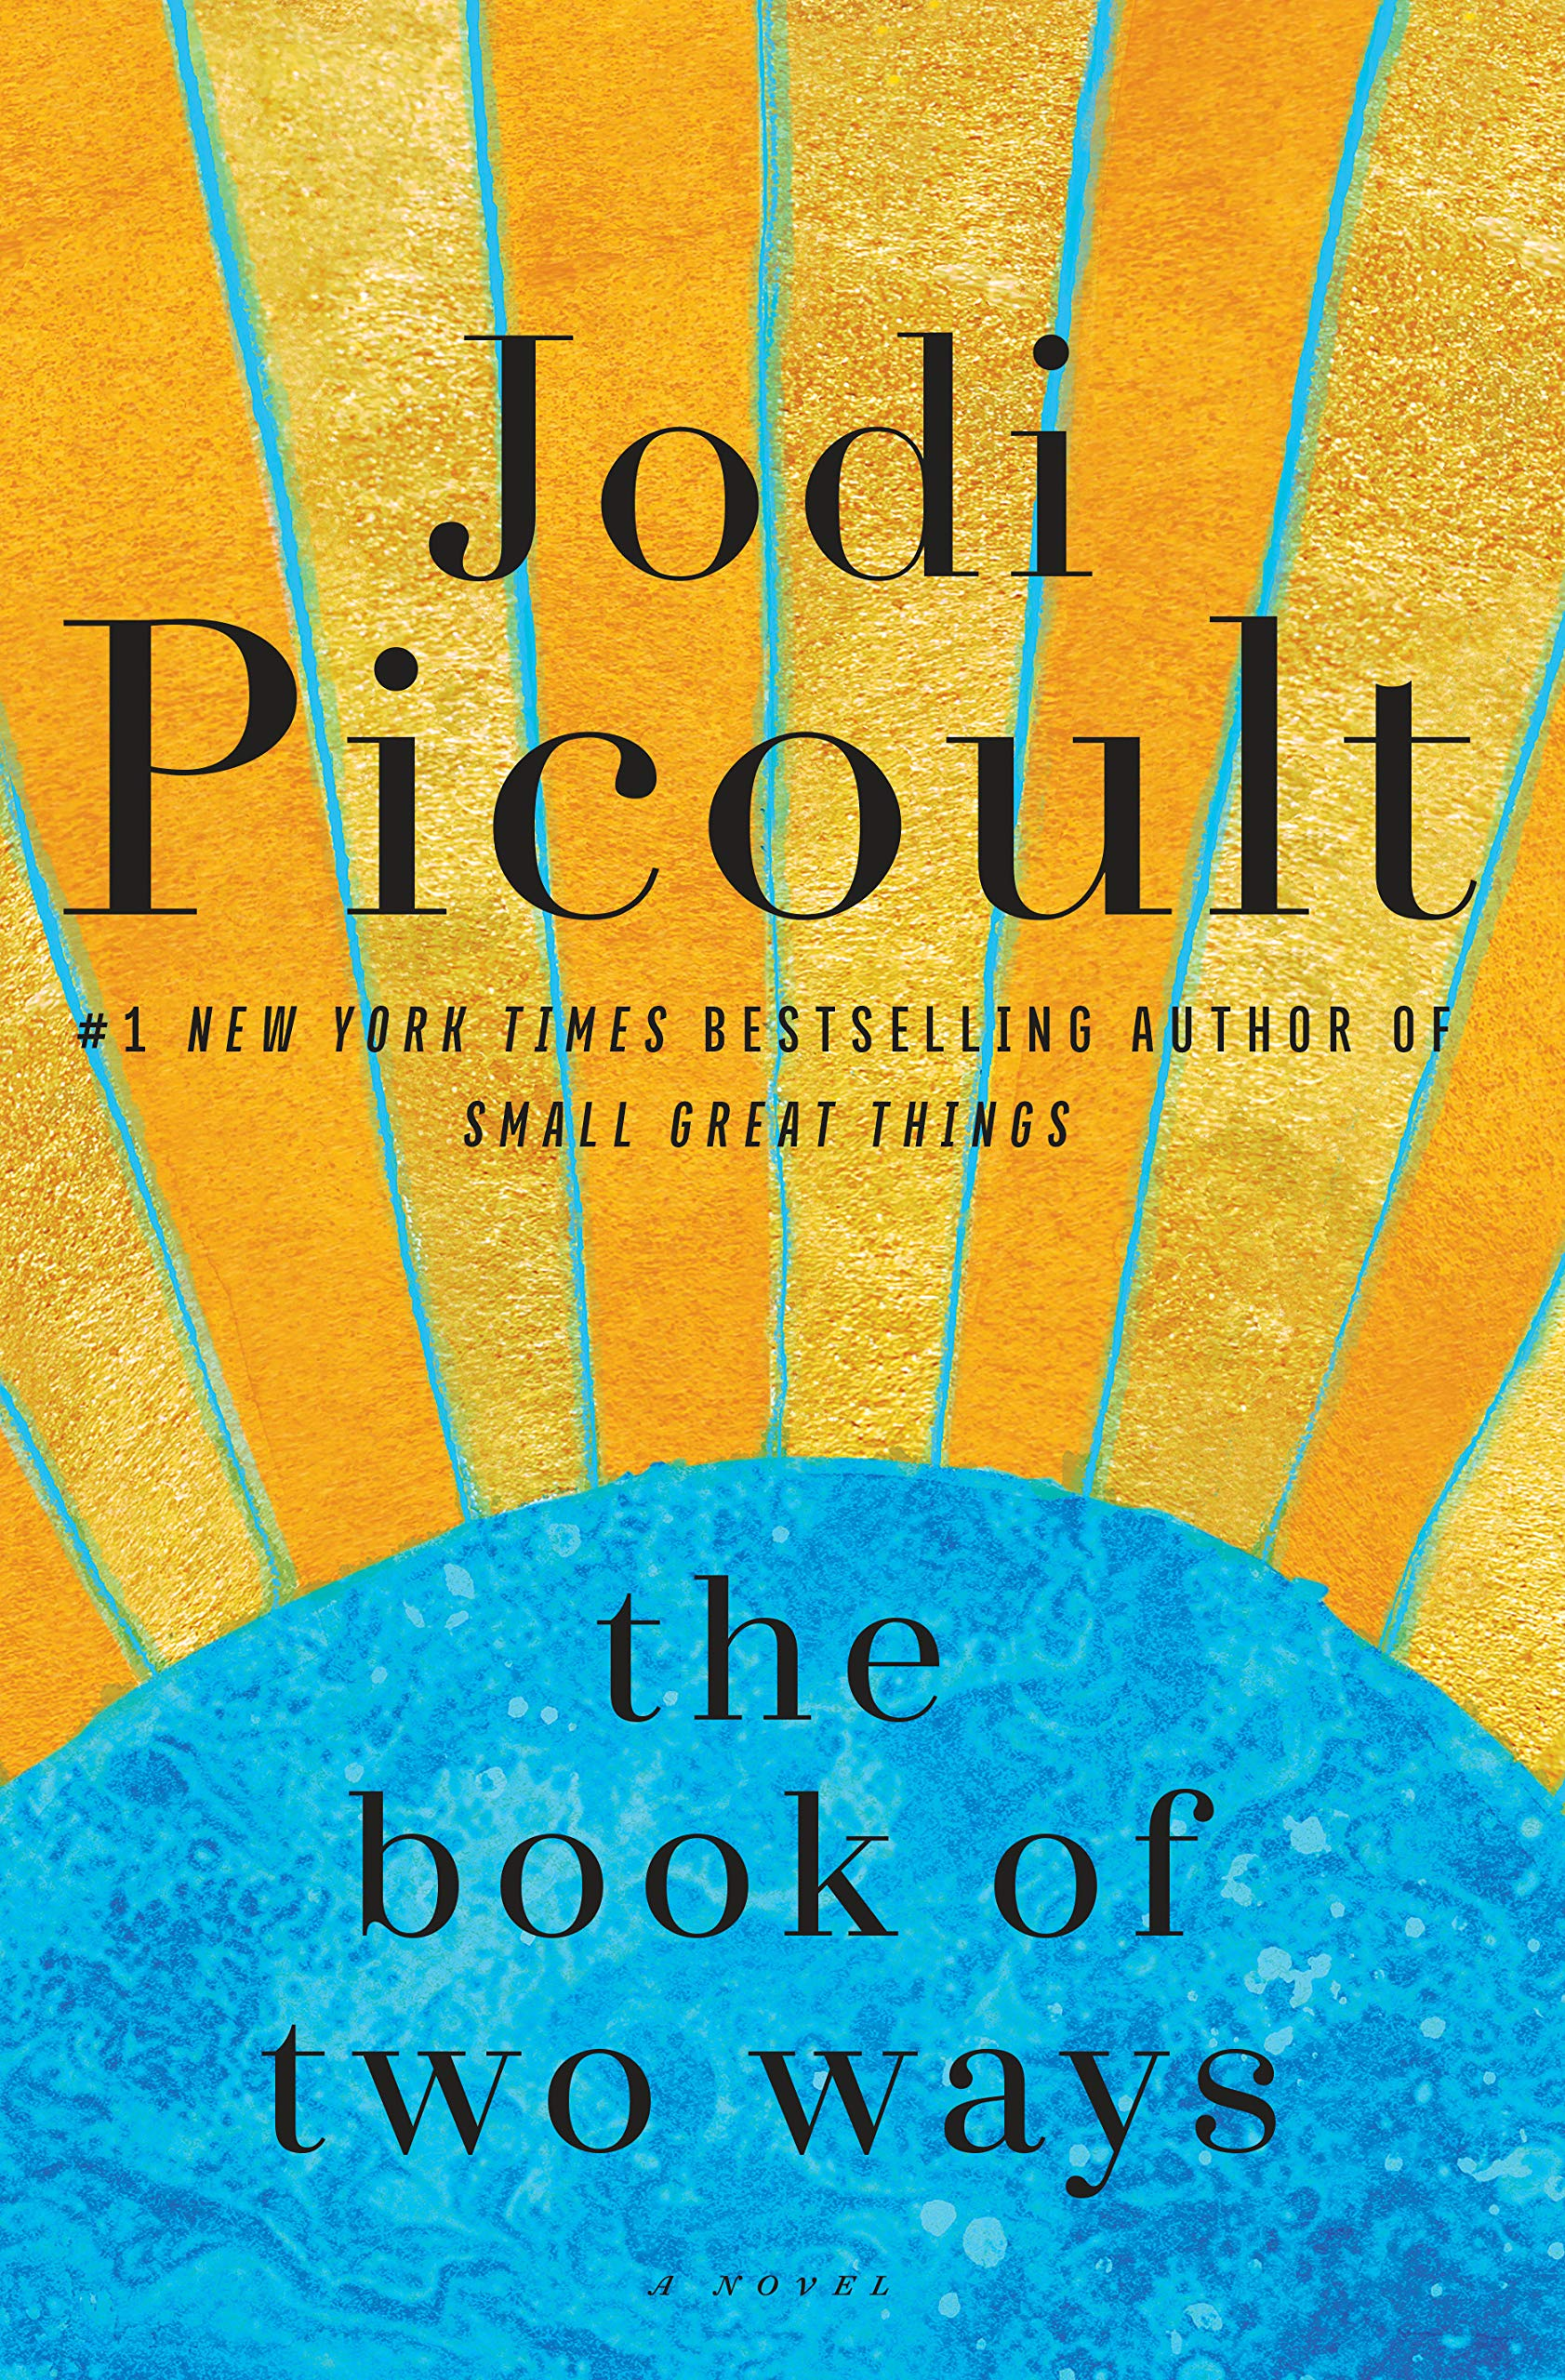 The Book of Two Ways: A Novel: Picoult, Jodi: 9781984818355: Amazon.com:  Books